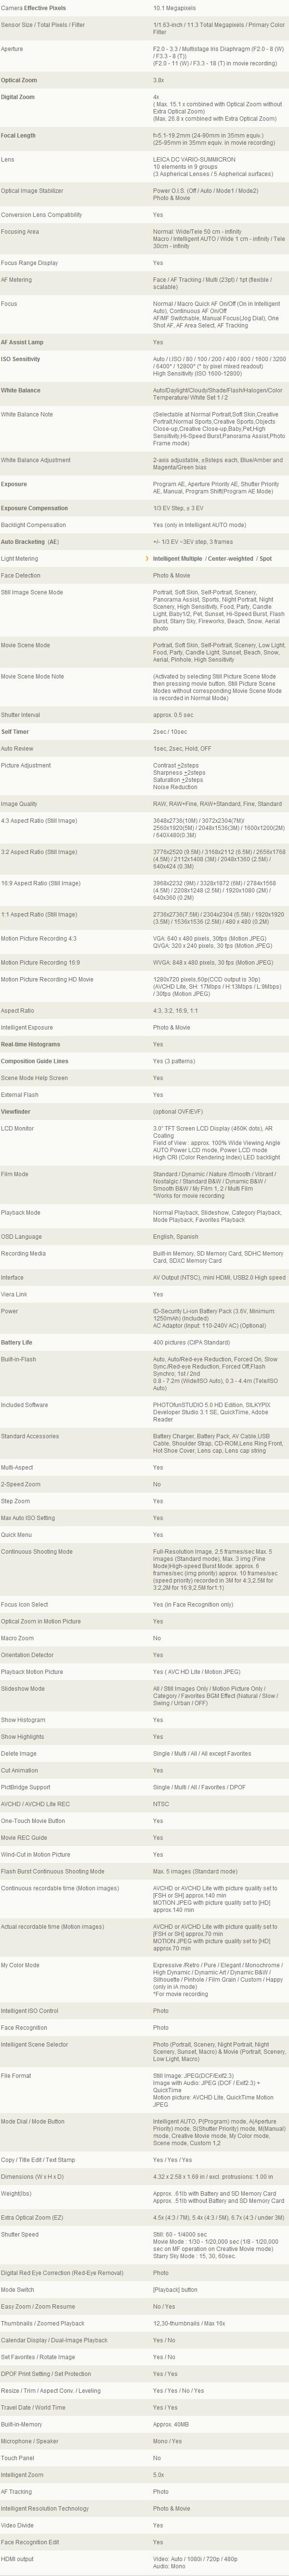 Panasonic Lumix DMC-LX5K high end compact=